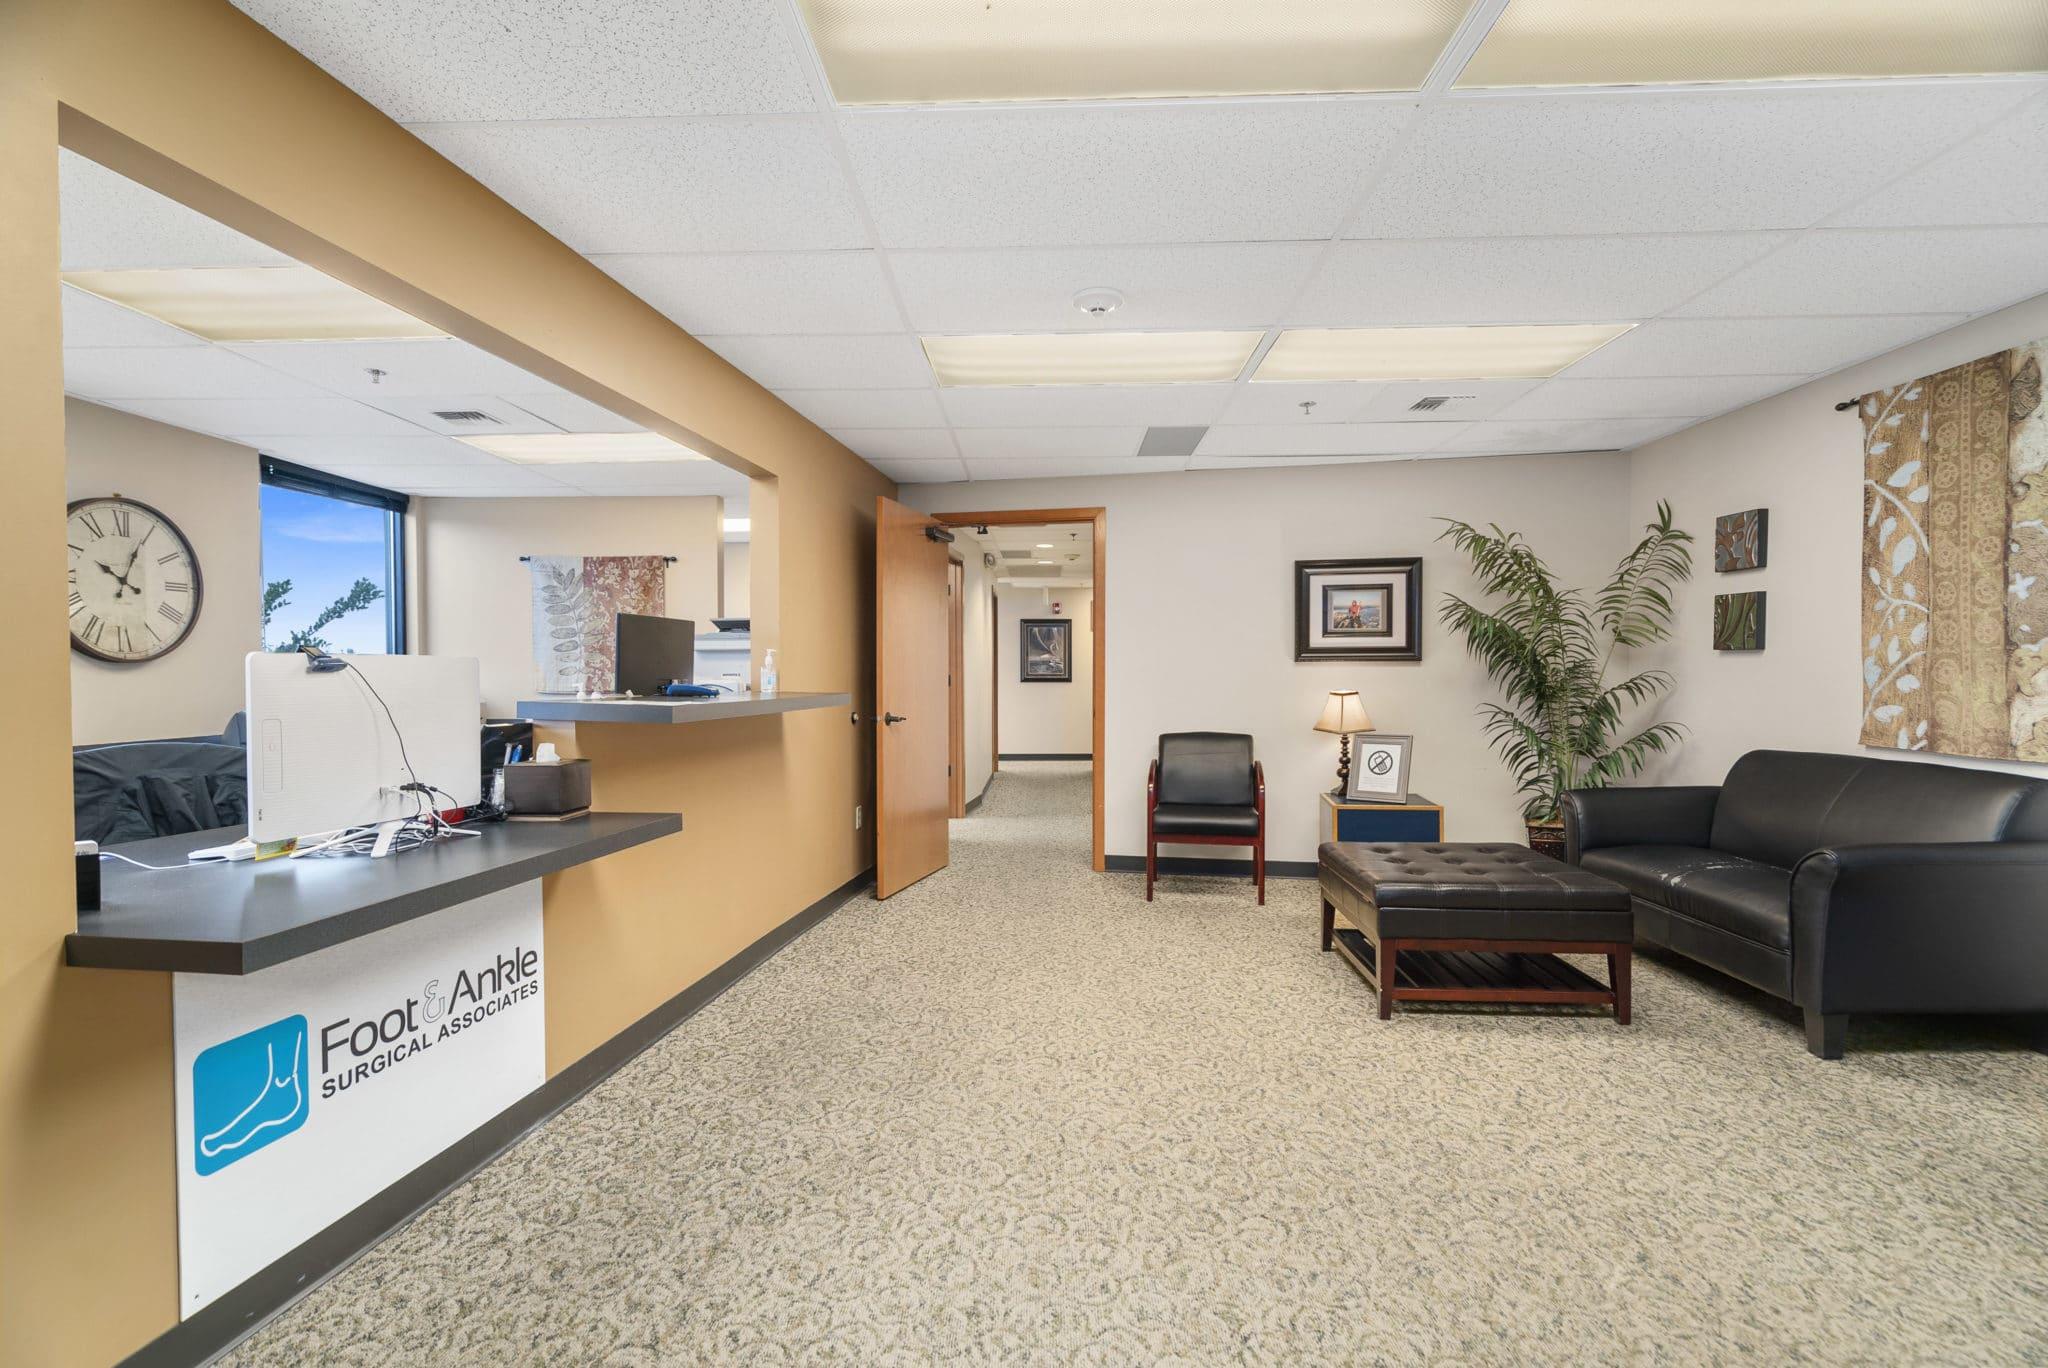 FASA Tacoma waiting room in front